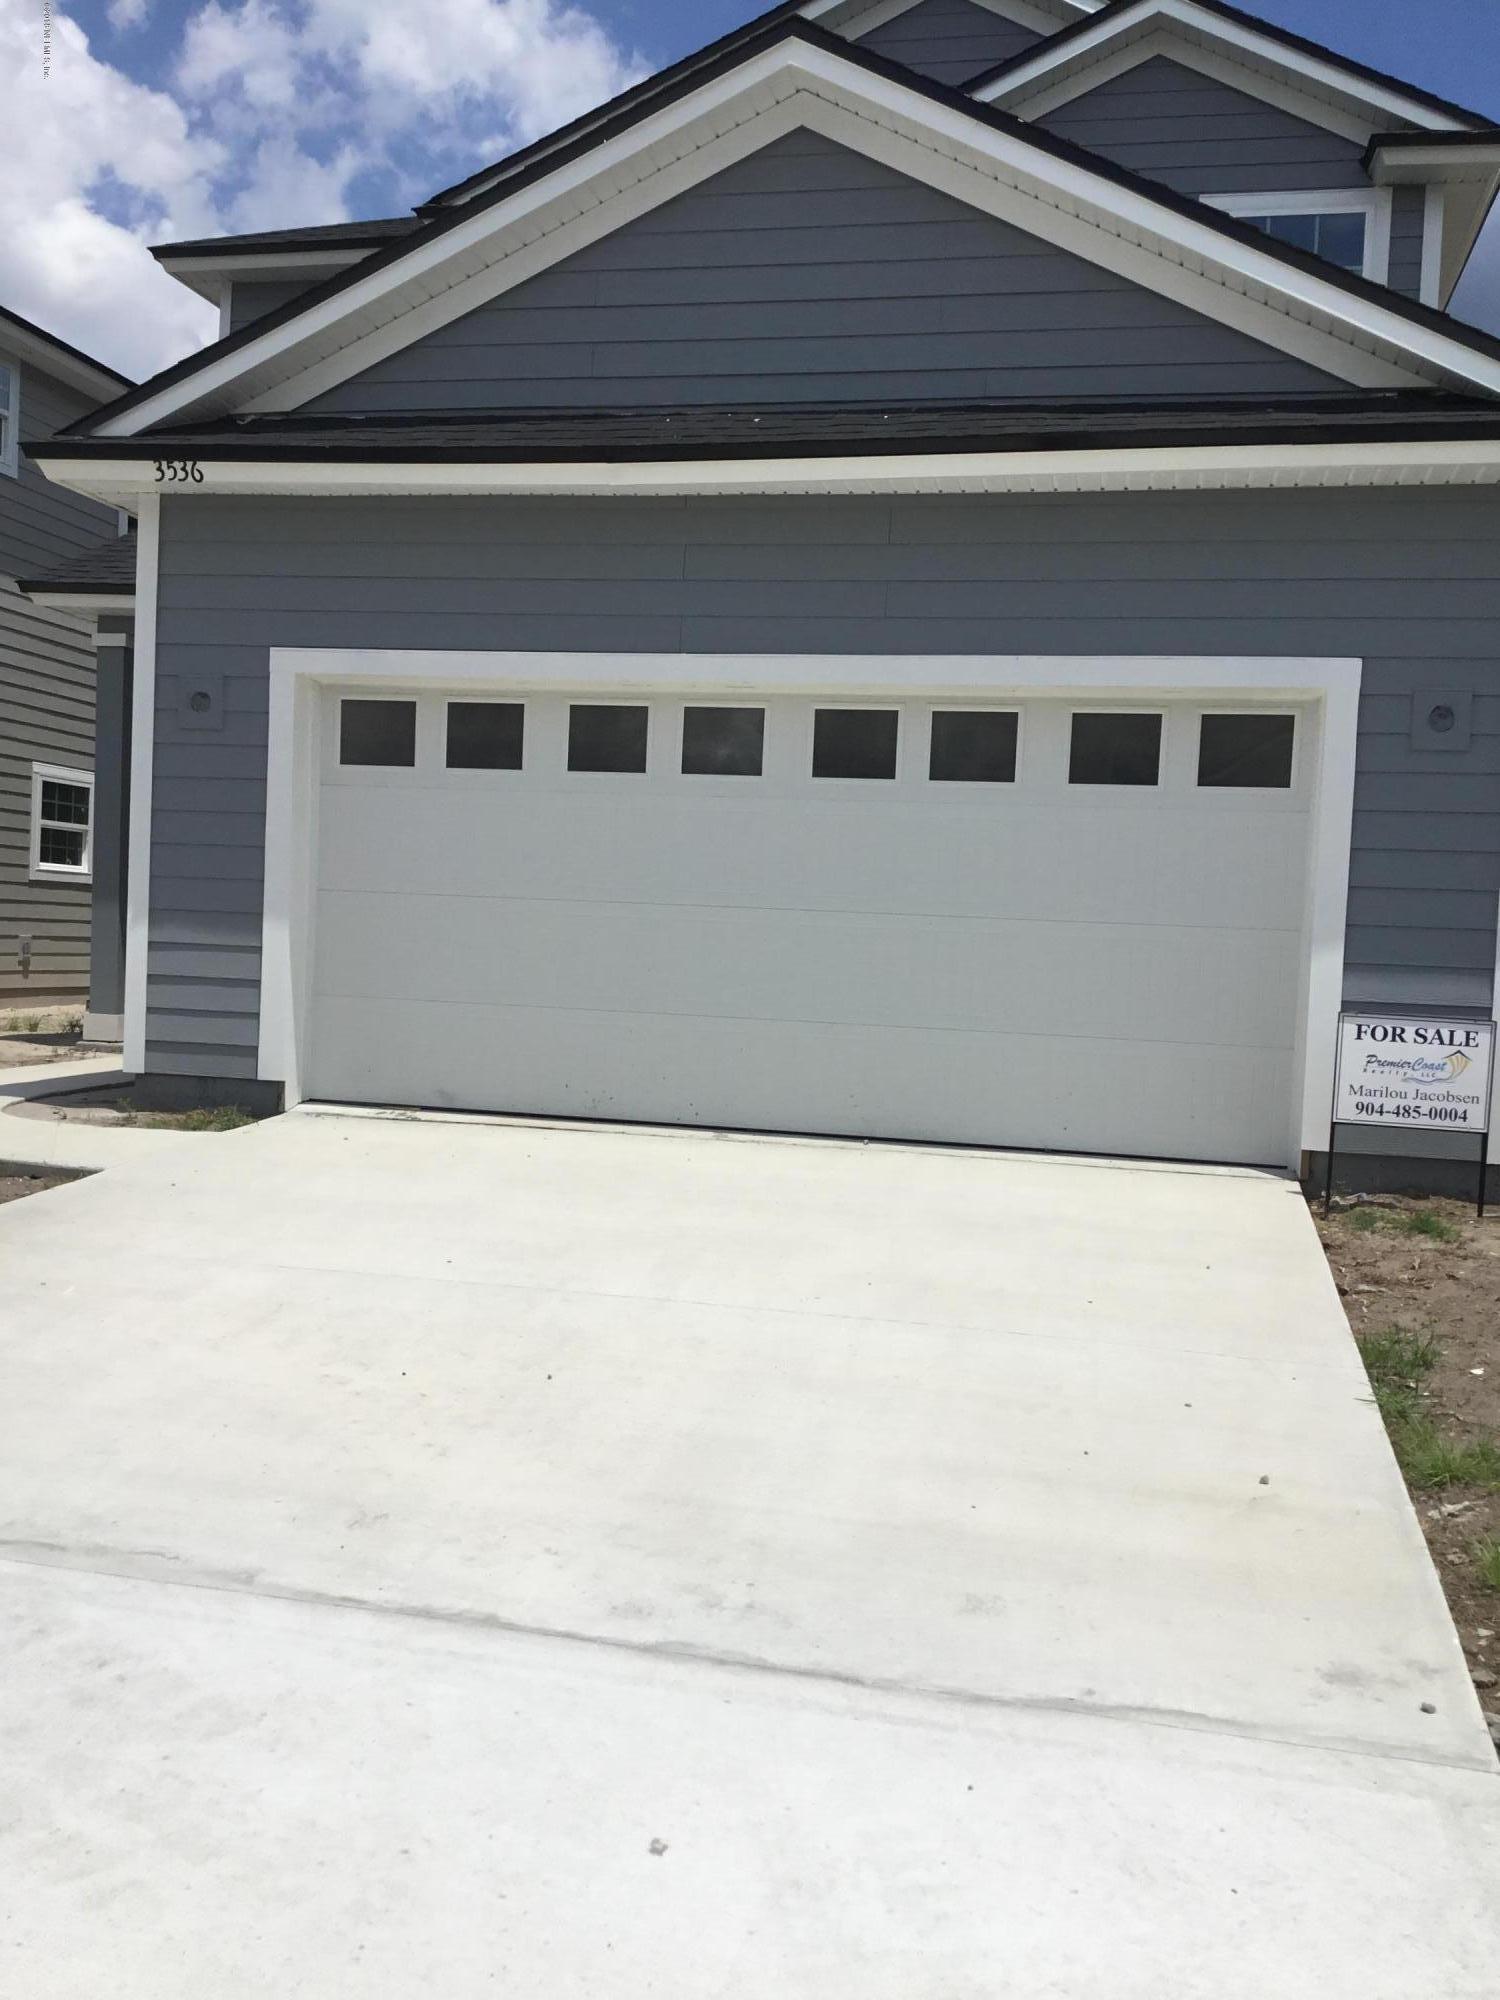 3536 HAWTHORN, ORANGE PARK, FLORIDA 32065, 4 Bedrooms Bedrooms, ,3 BathroomsBathrooms,Residential - single family,For sale,HAWTHORN,936262